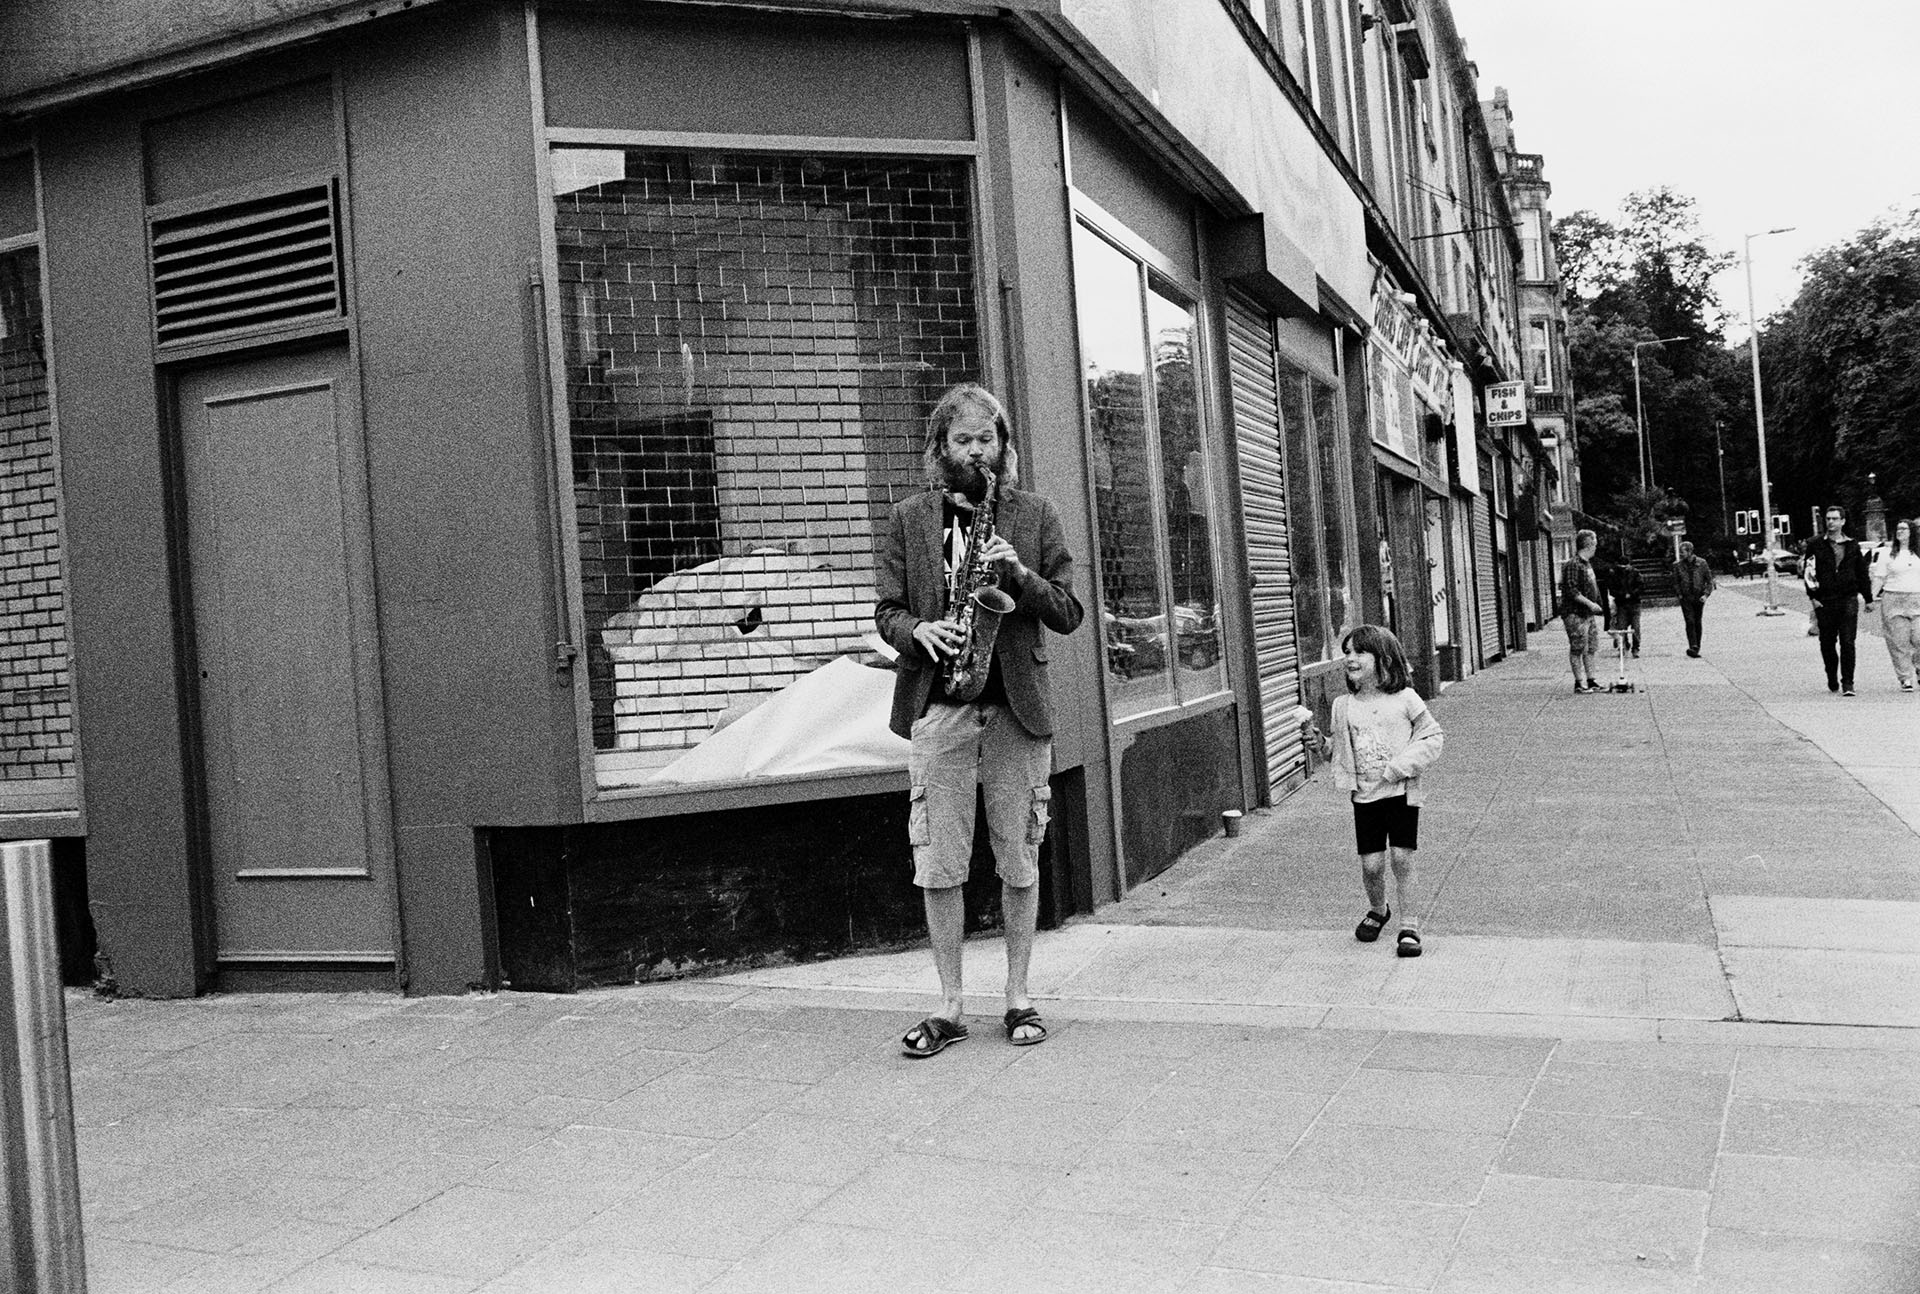 Glasgow street music festival